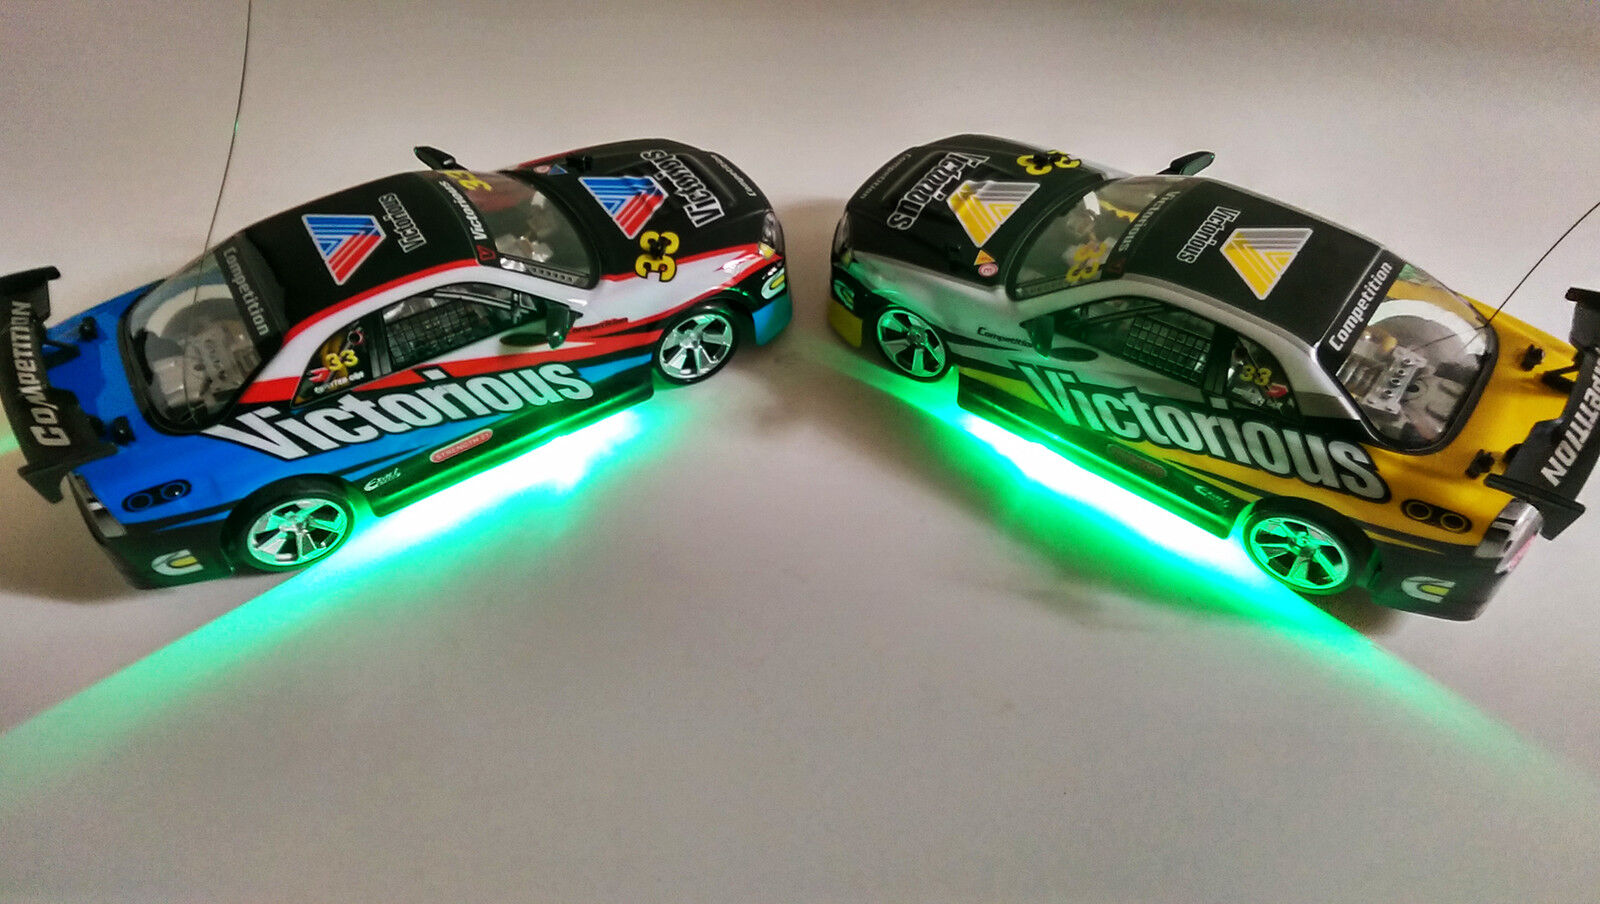 1-14 Control De Radio Rc 4WD Tokio Drift Drift Drift réplica Rápido y Furioso Nissan Skyline  a la venta